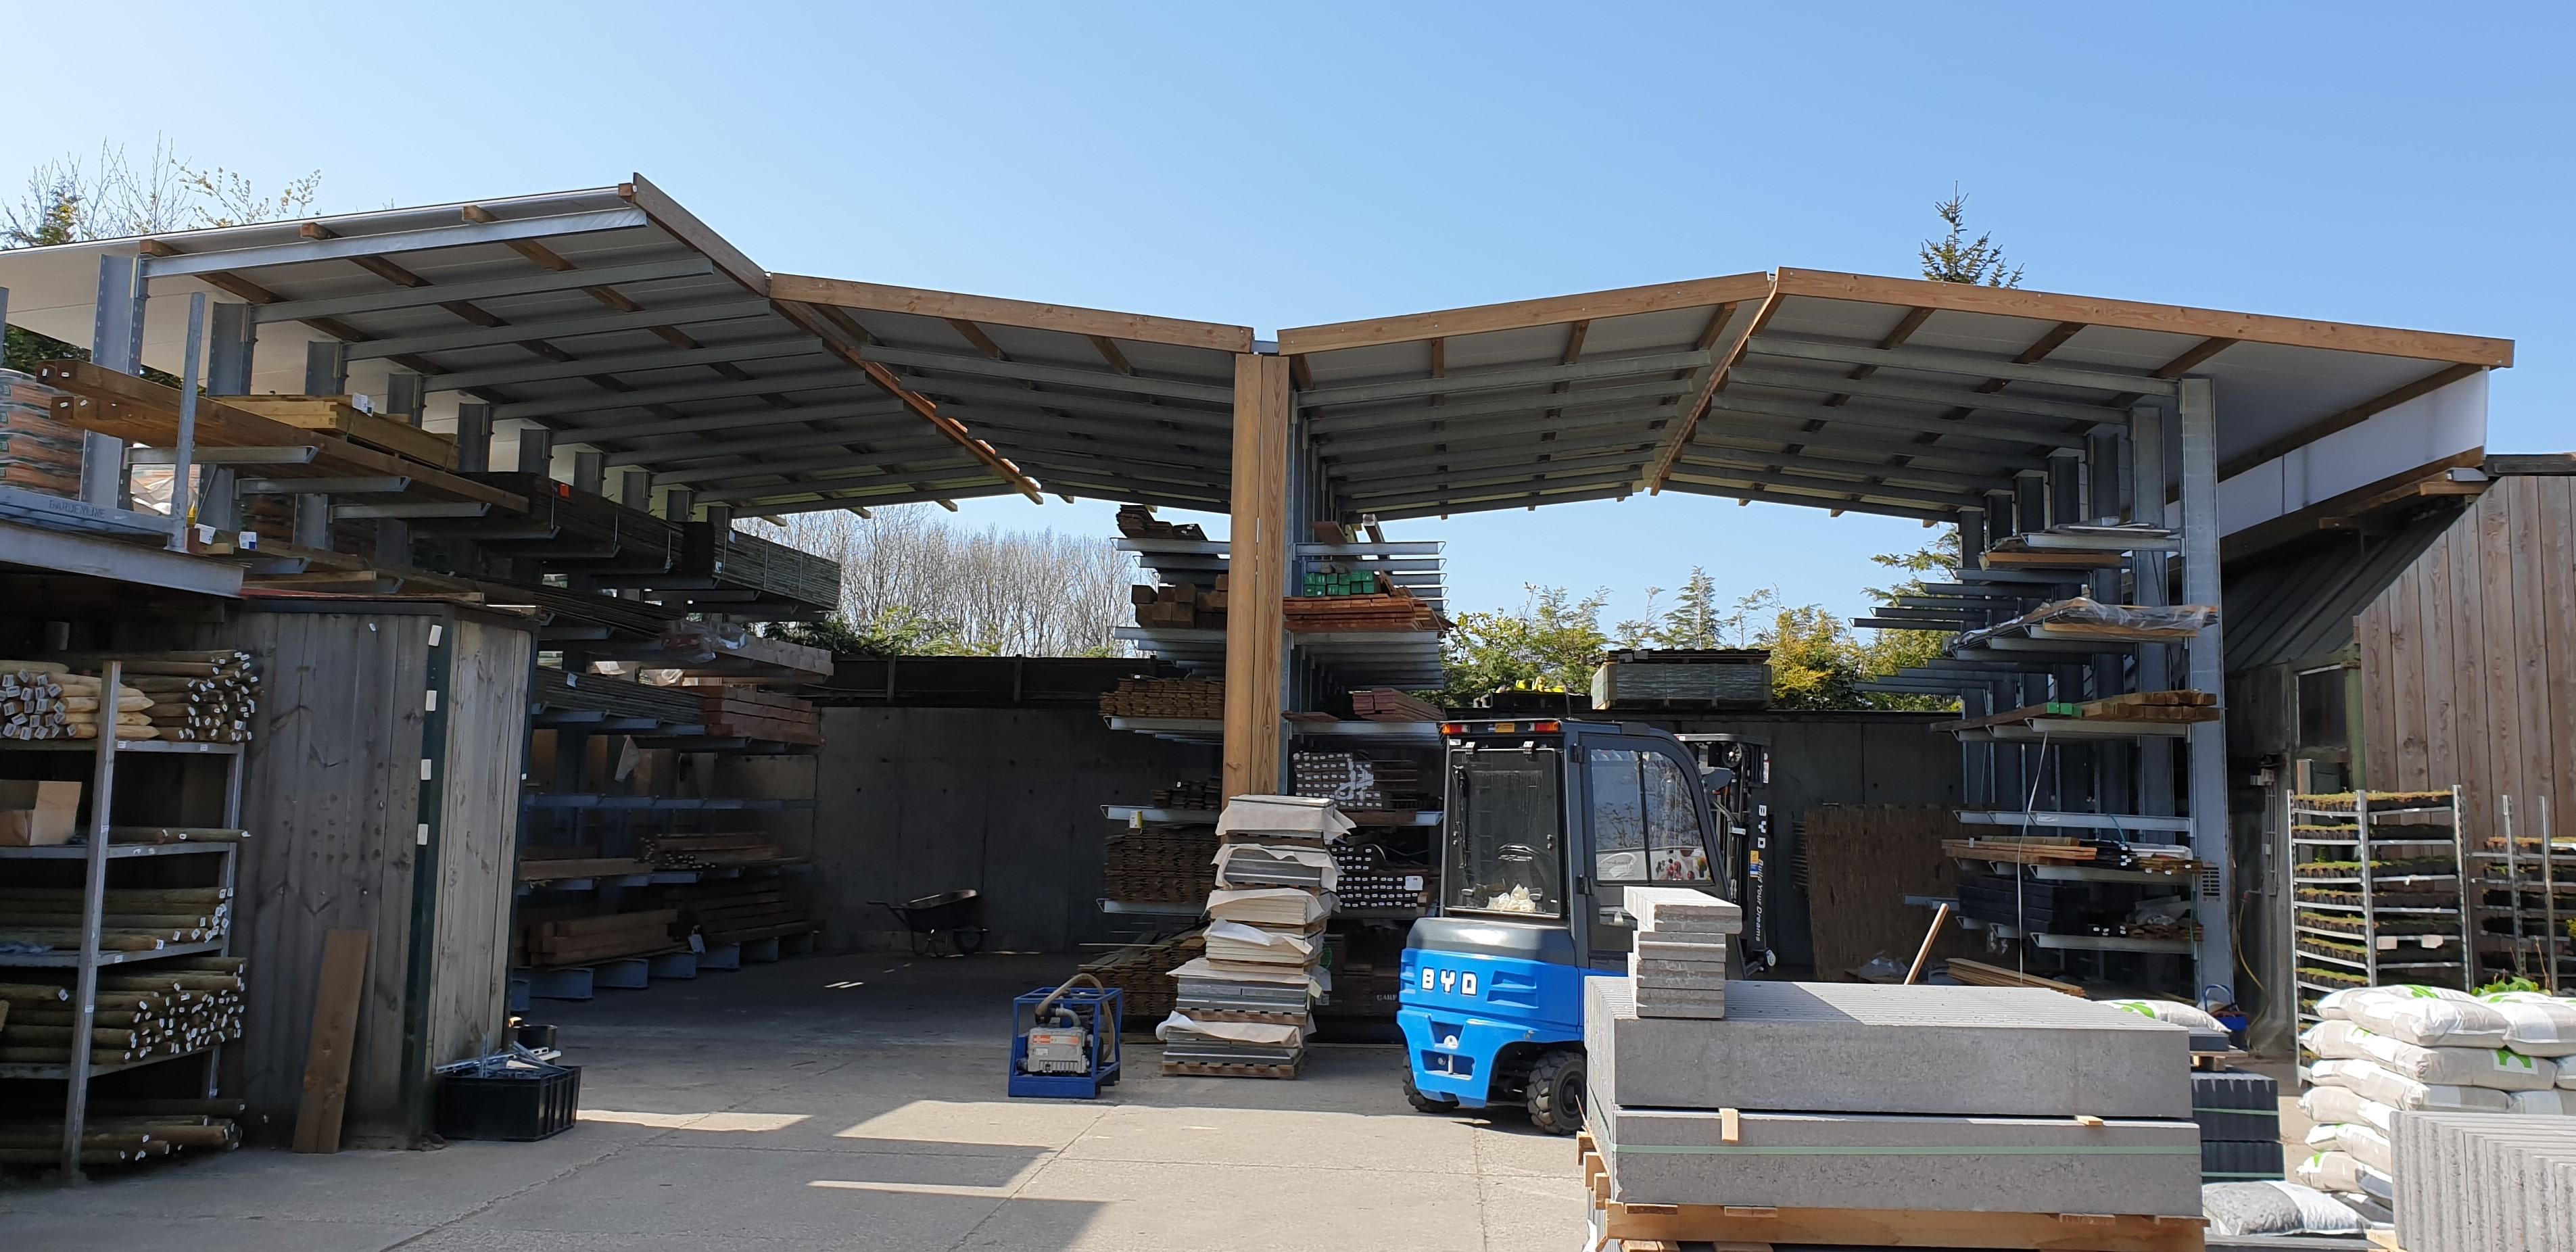 Buitenopslag in een draagarmstelling met dak uit voorraad leverbaar